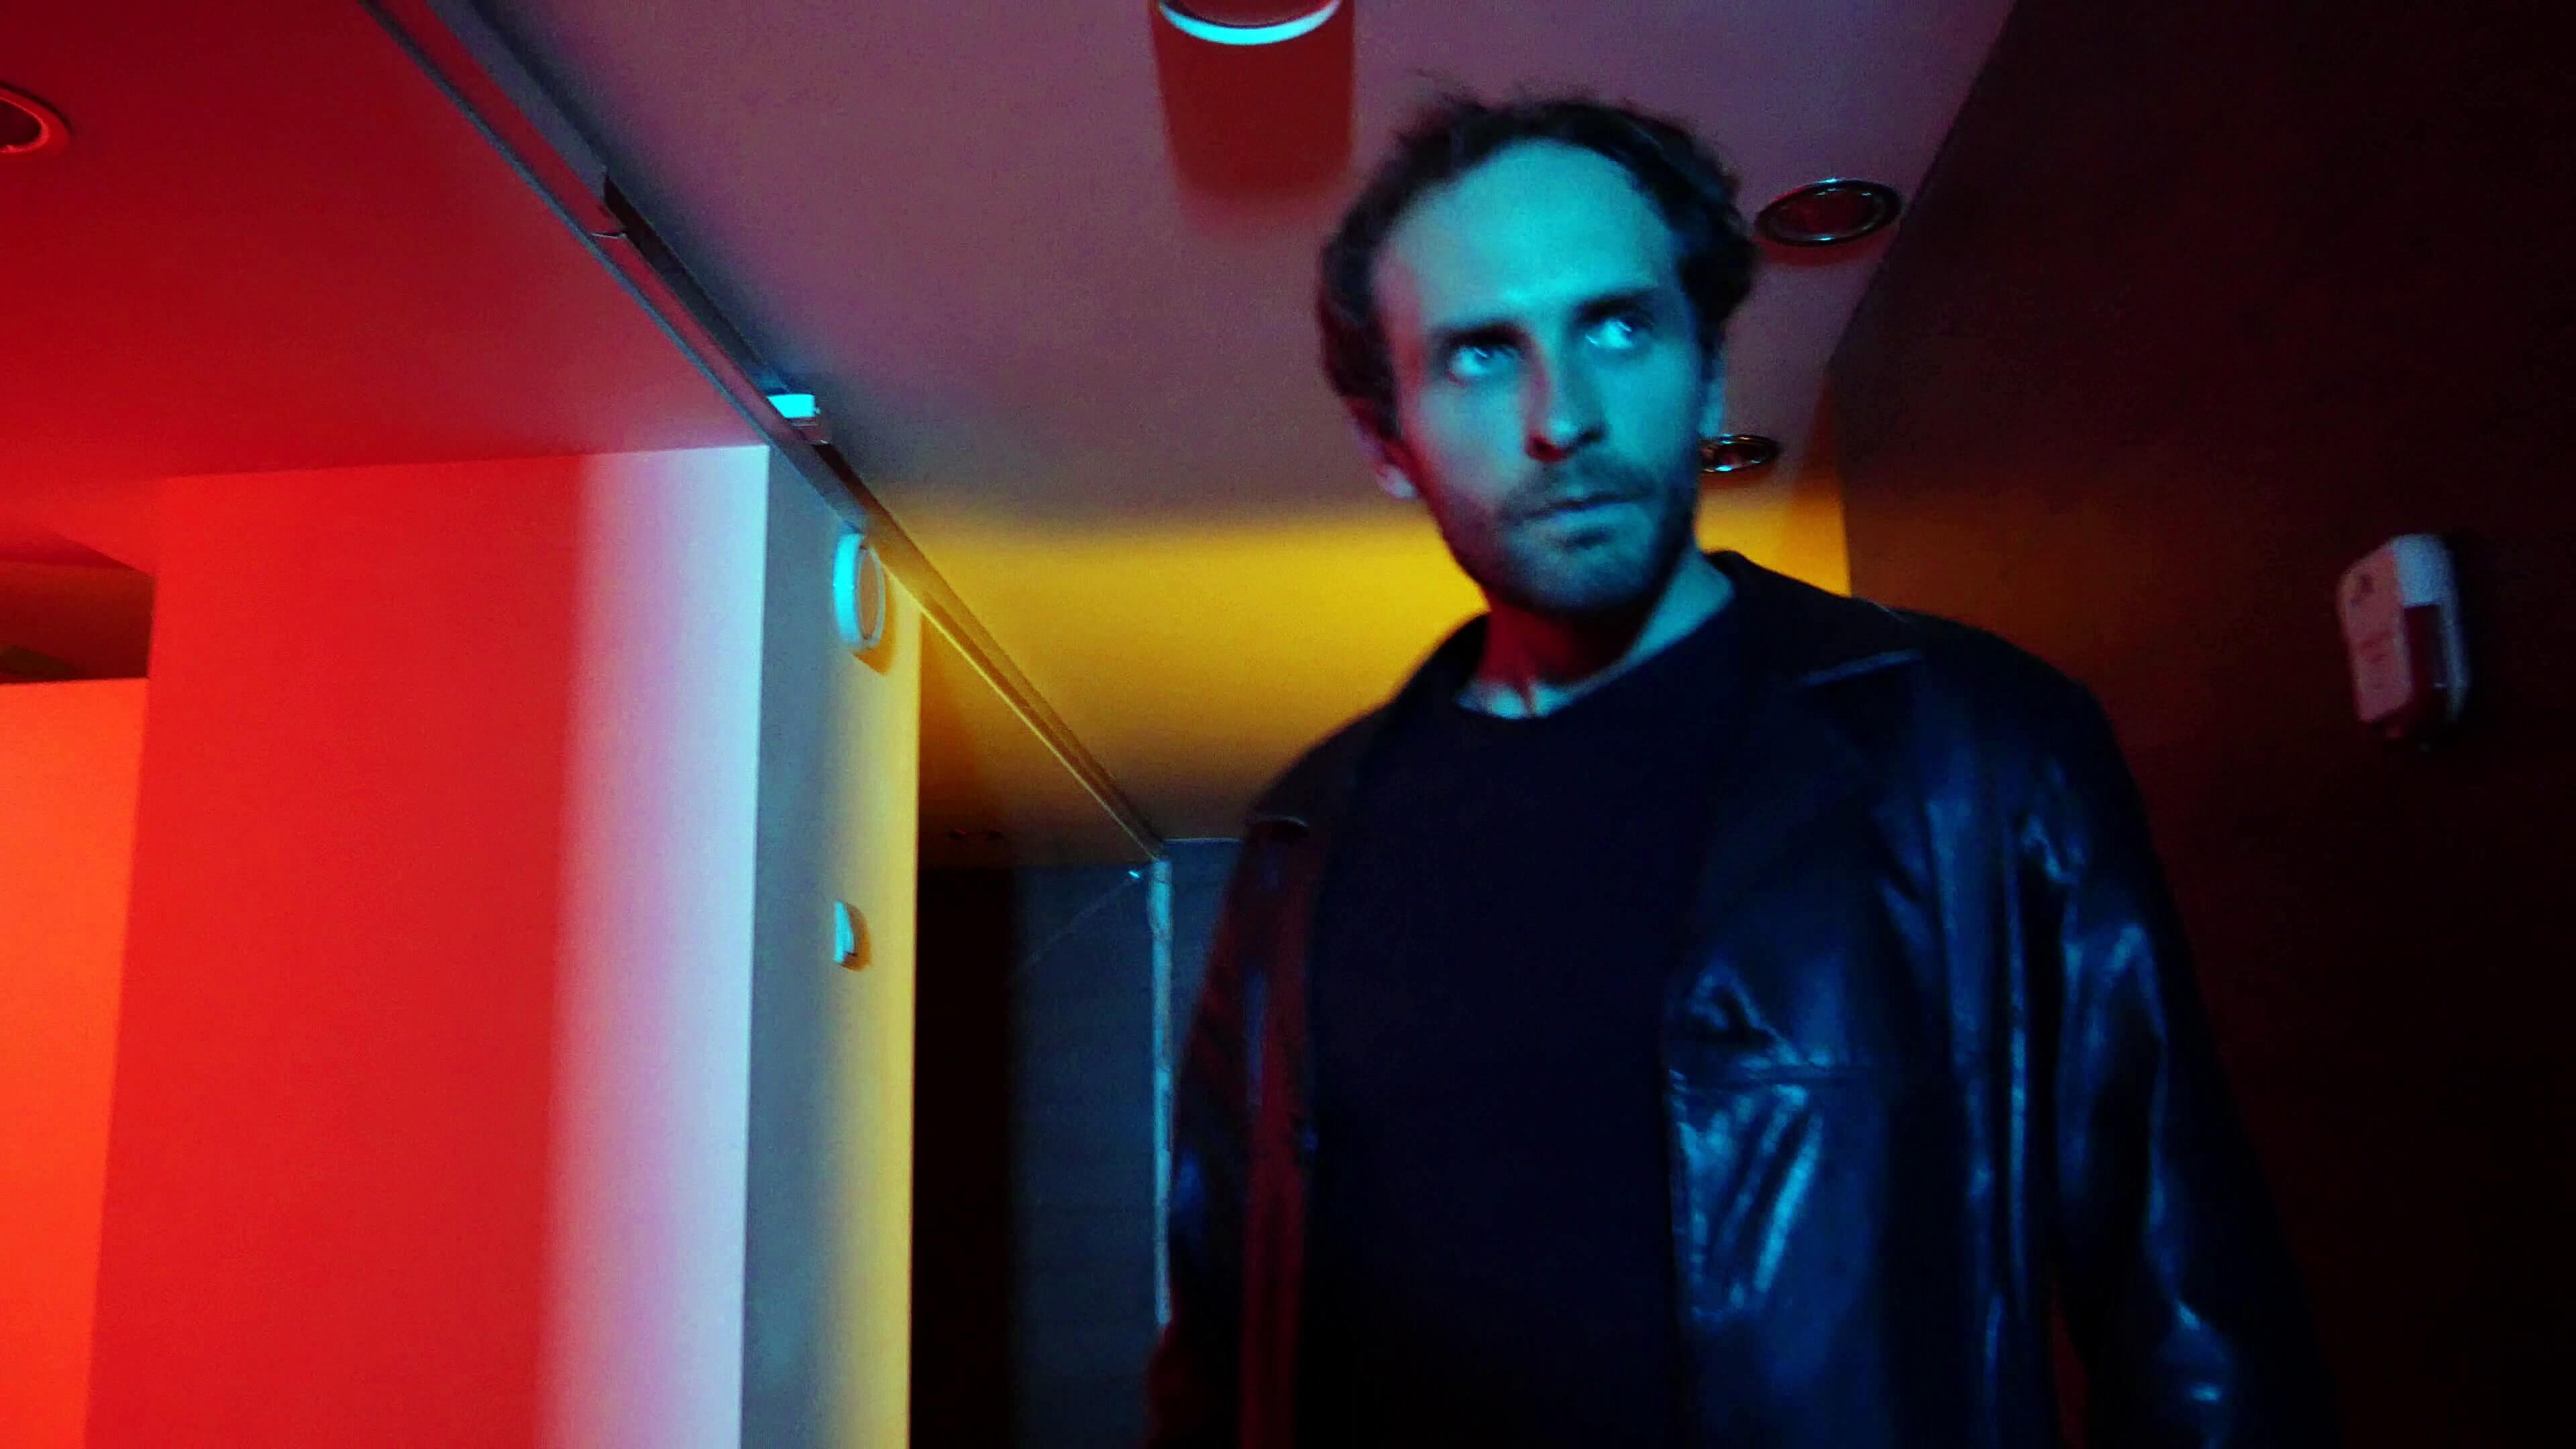 maniac scene digital dawn web se - action, cyberpunk, episode, noir, technoir, webseries